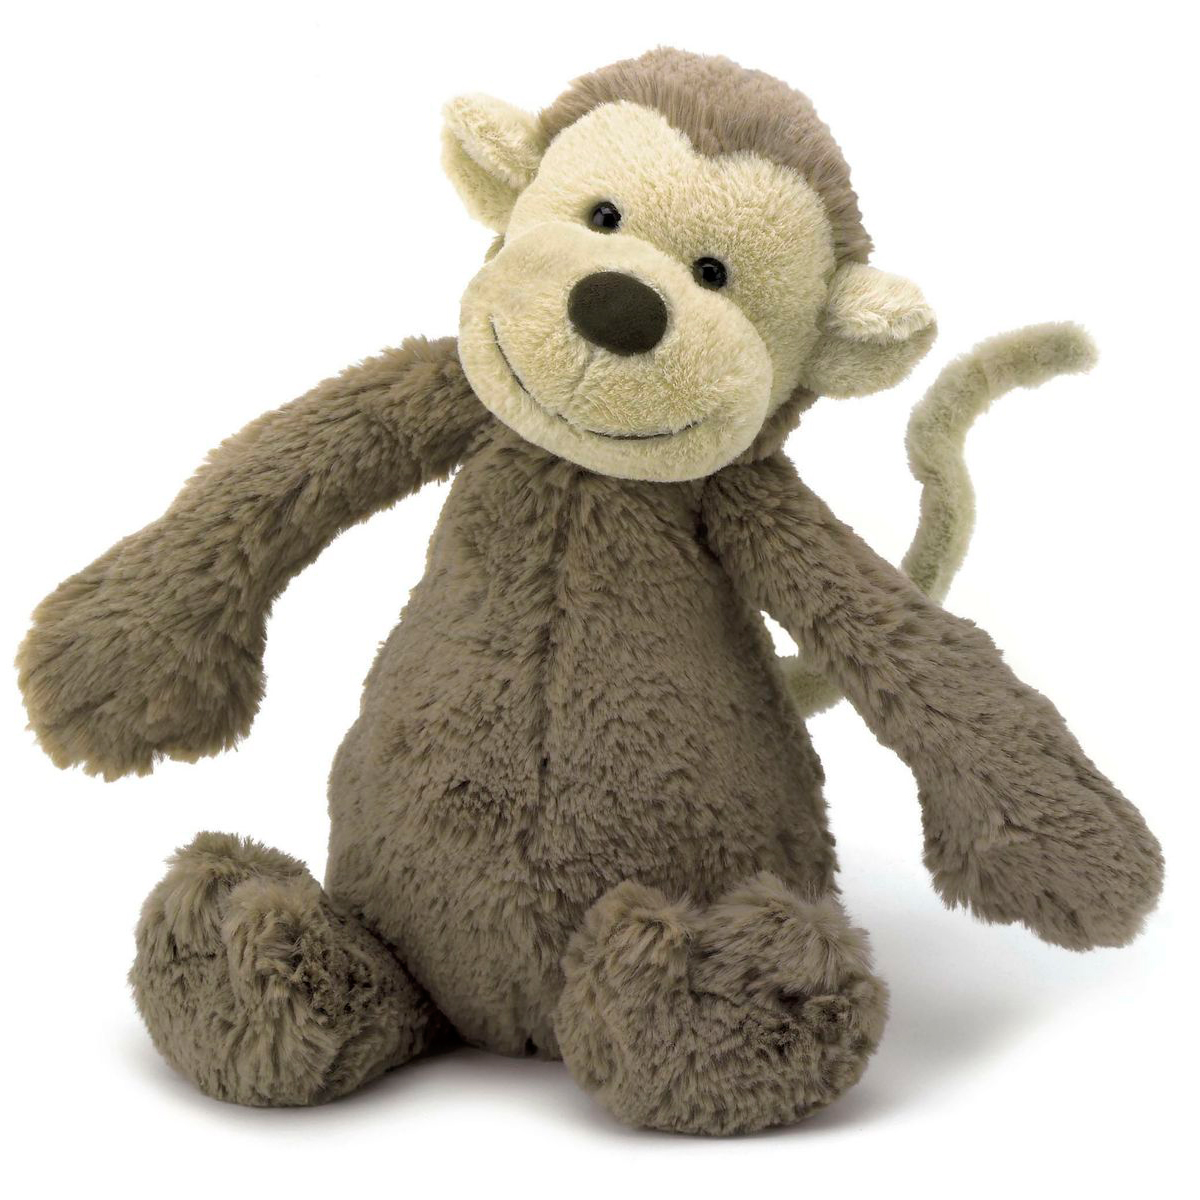 Peluche Bashful Monkey - Peluche Singe 31 cm Bashful Monkey - Peluche Singe 31 cm